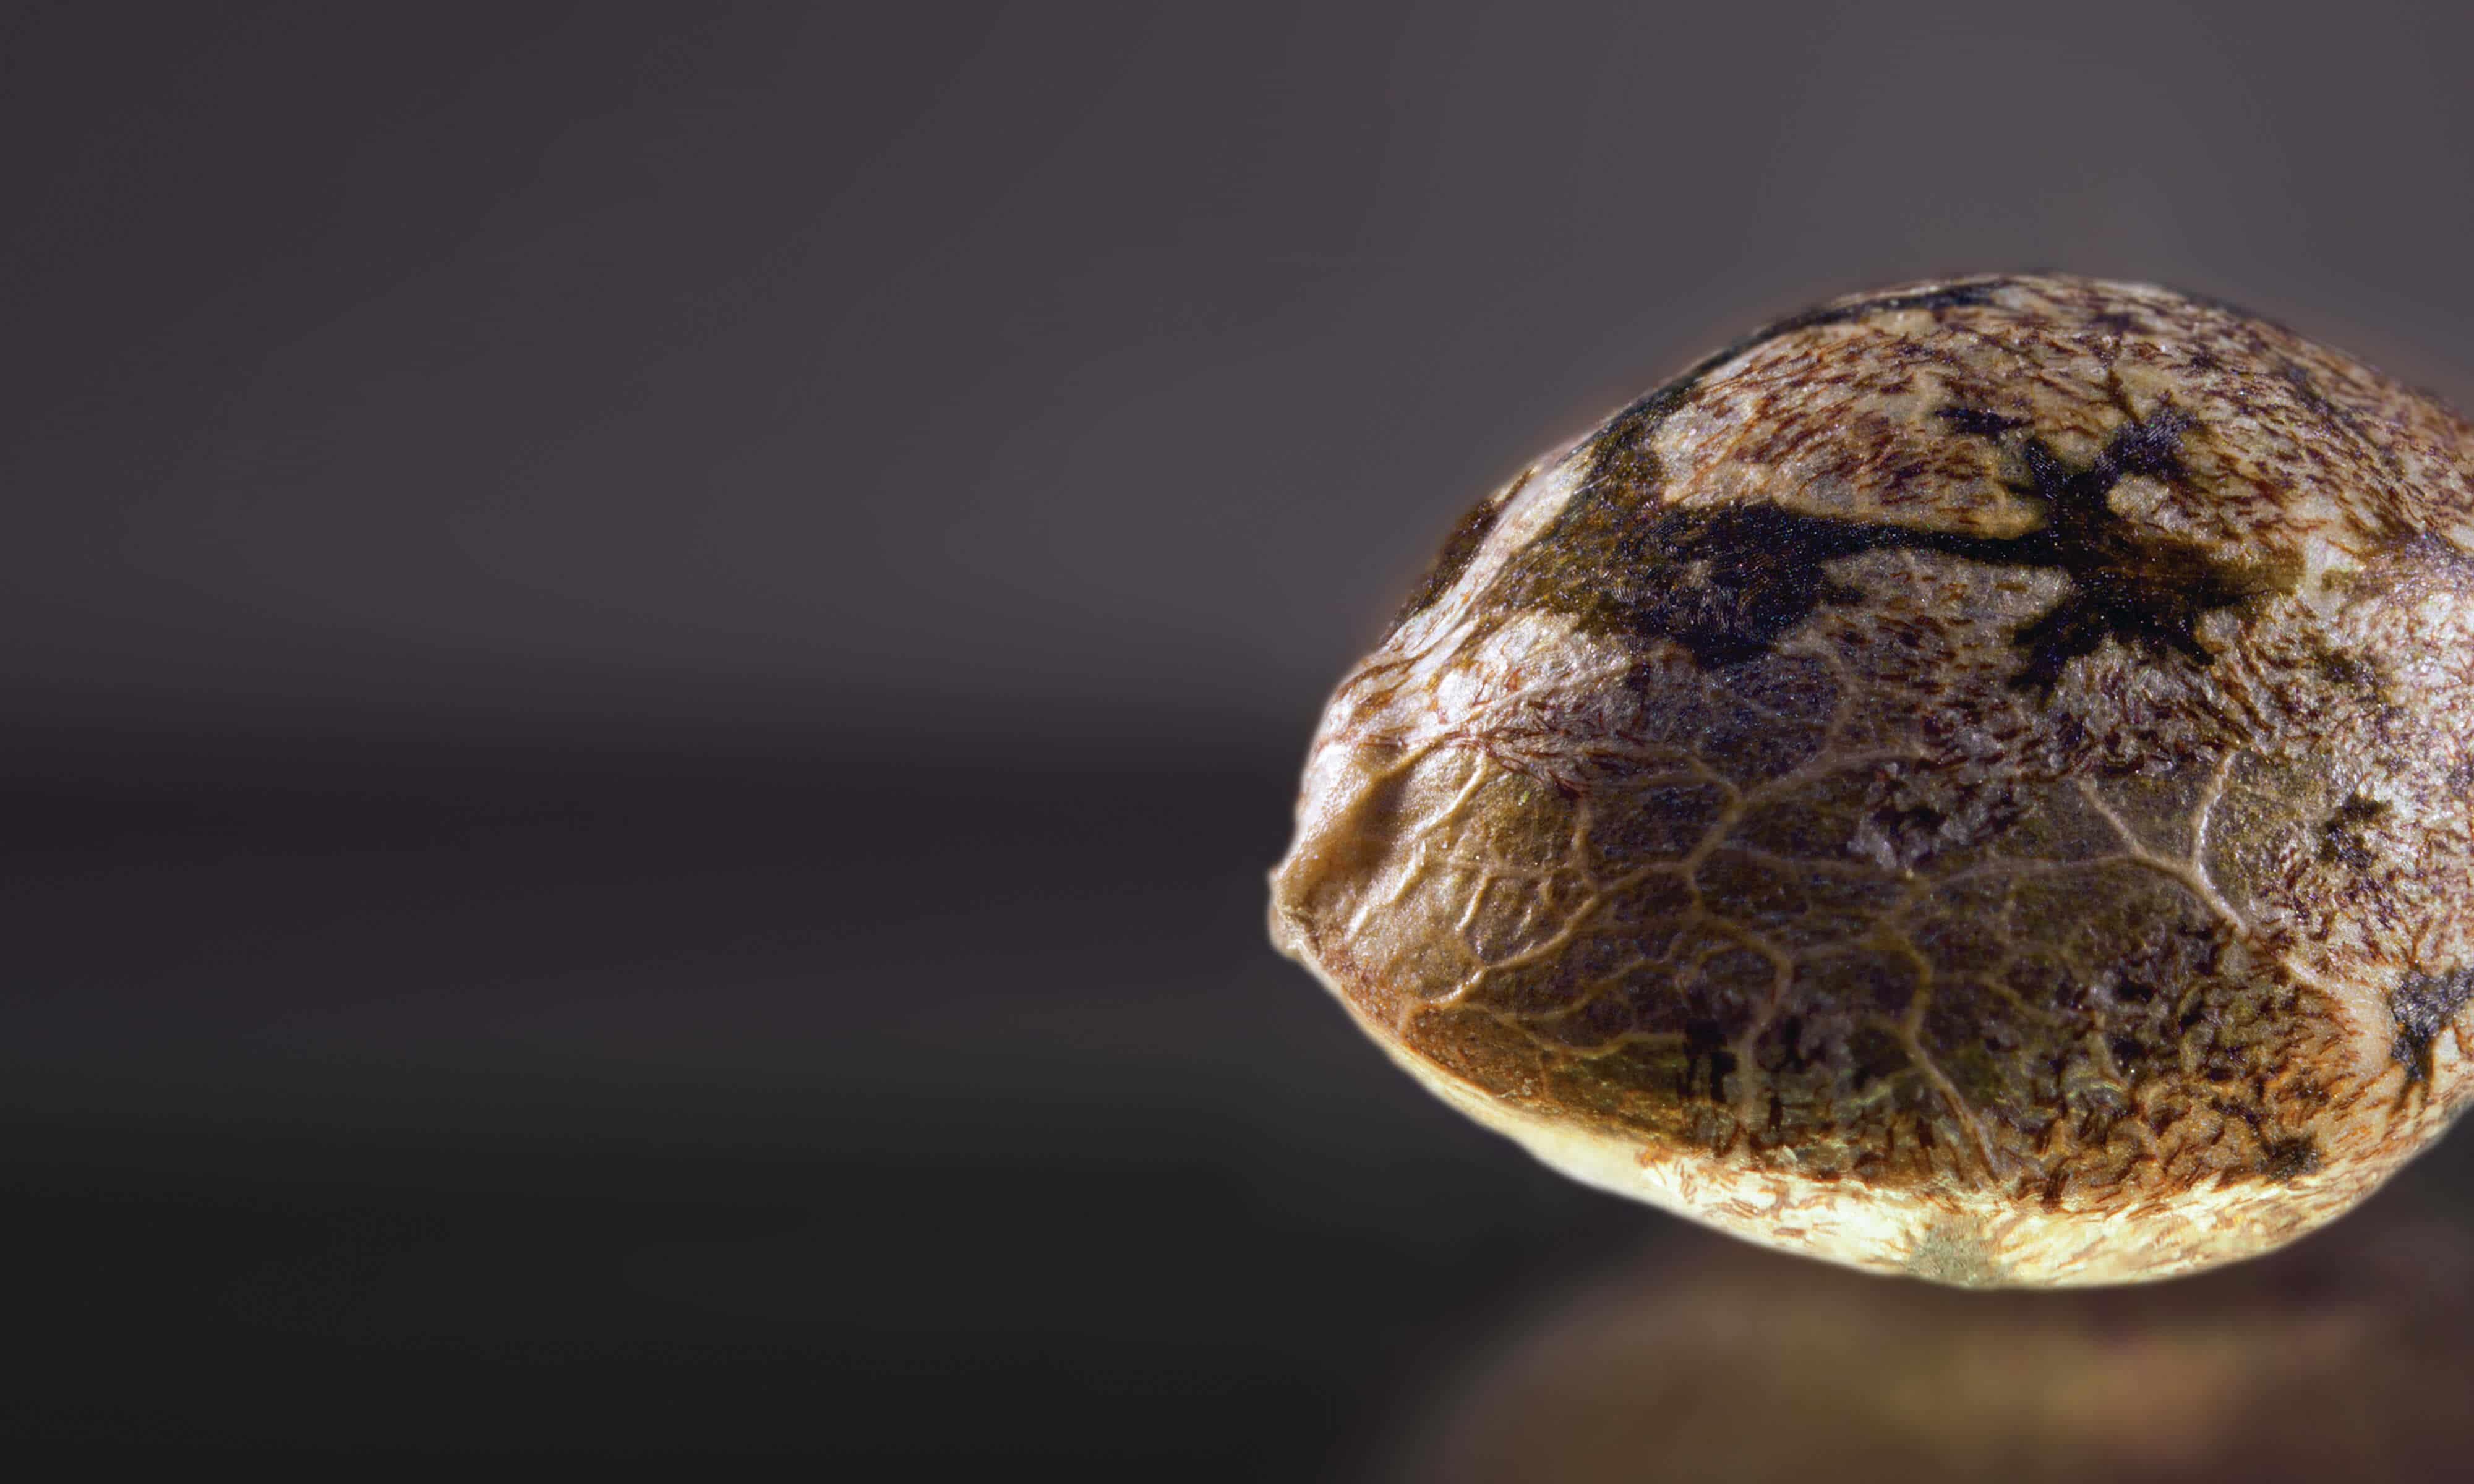 Female Marijuana Seed Picture